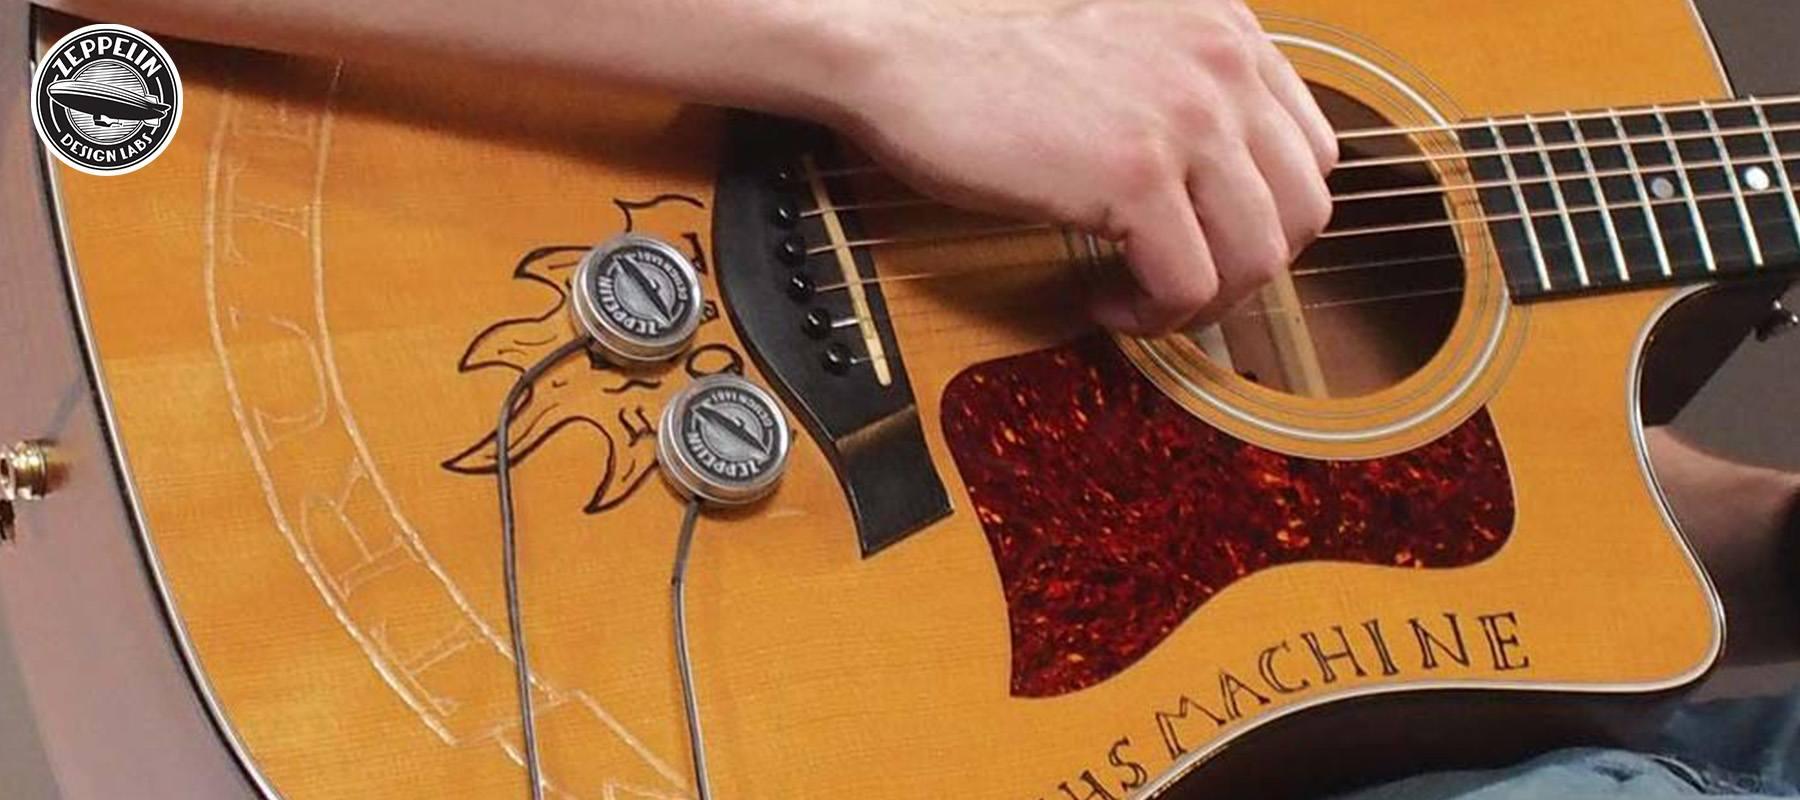 Cortado MkIII - Guitar contact microphone